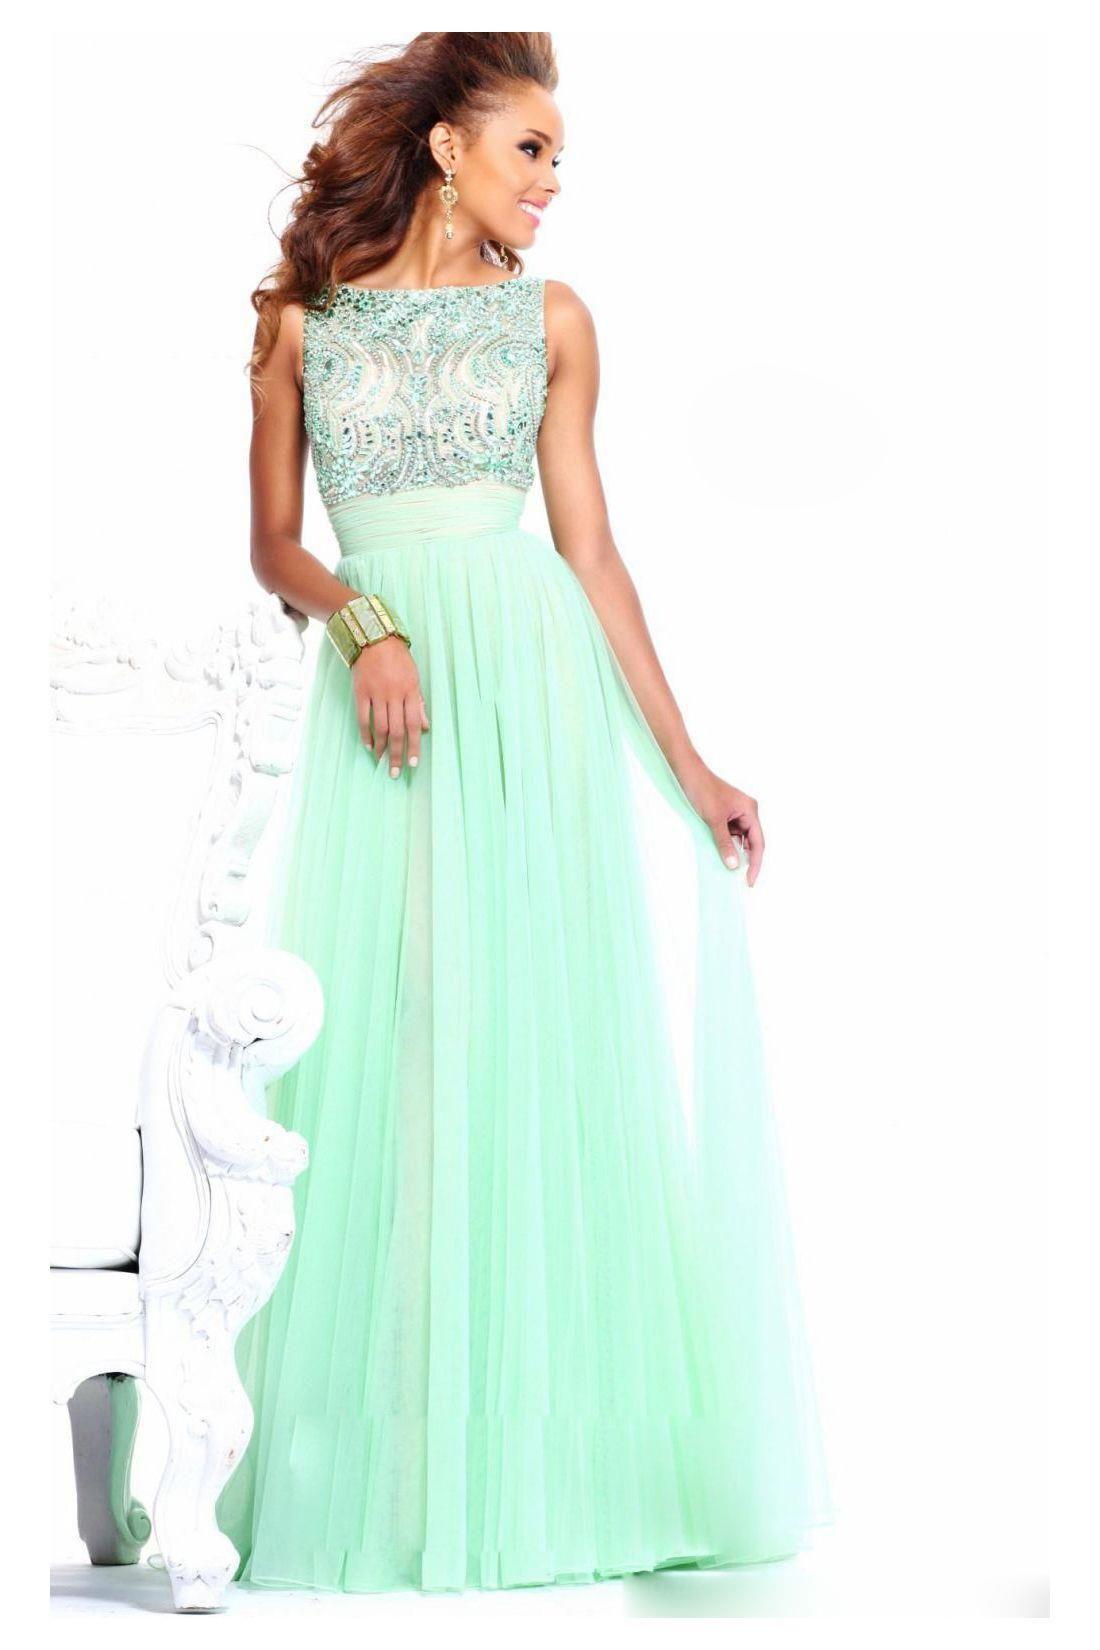 Bateau sleeveless floorlength long light yellow prom dresses uk